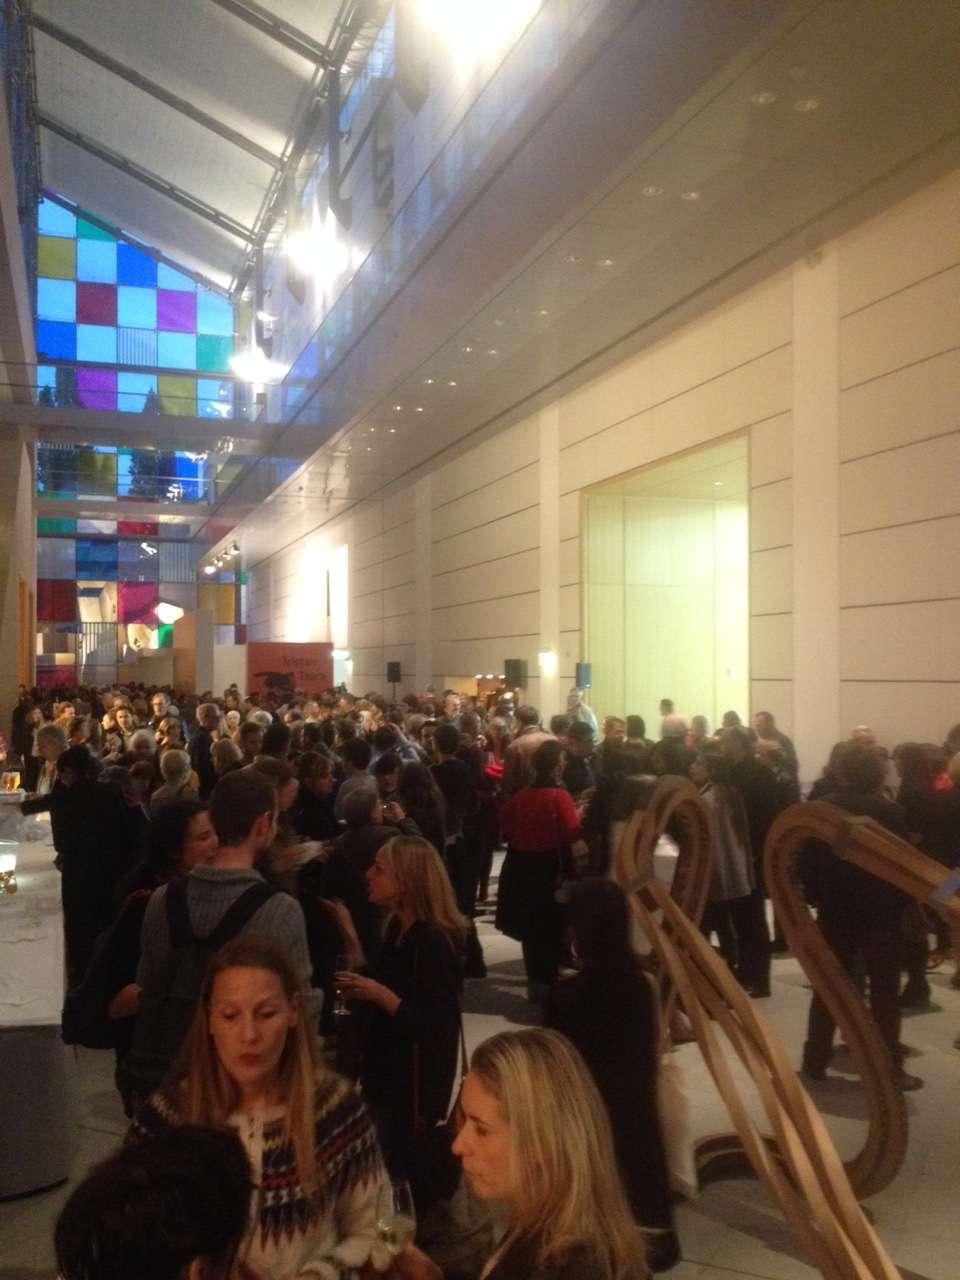 Invitatii la vernisajul expozitiei consacrate lui Tristan Tzara la MAMCS